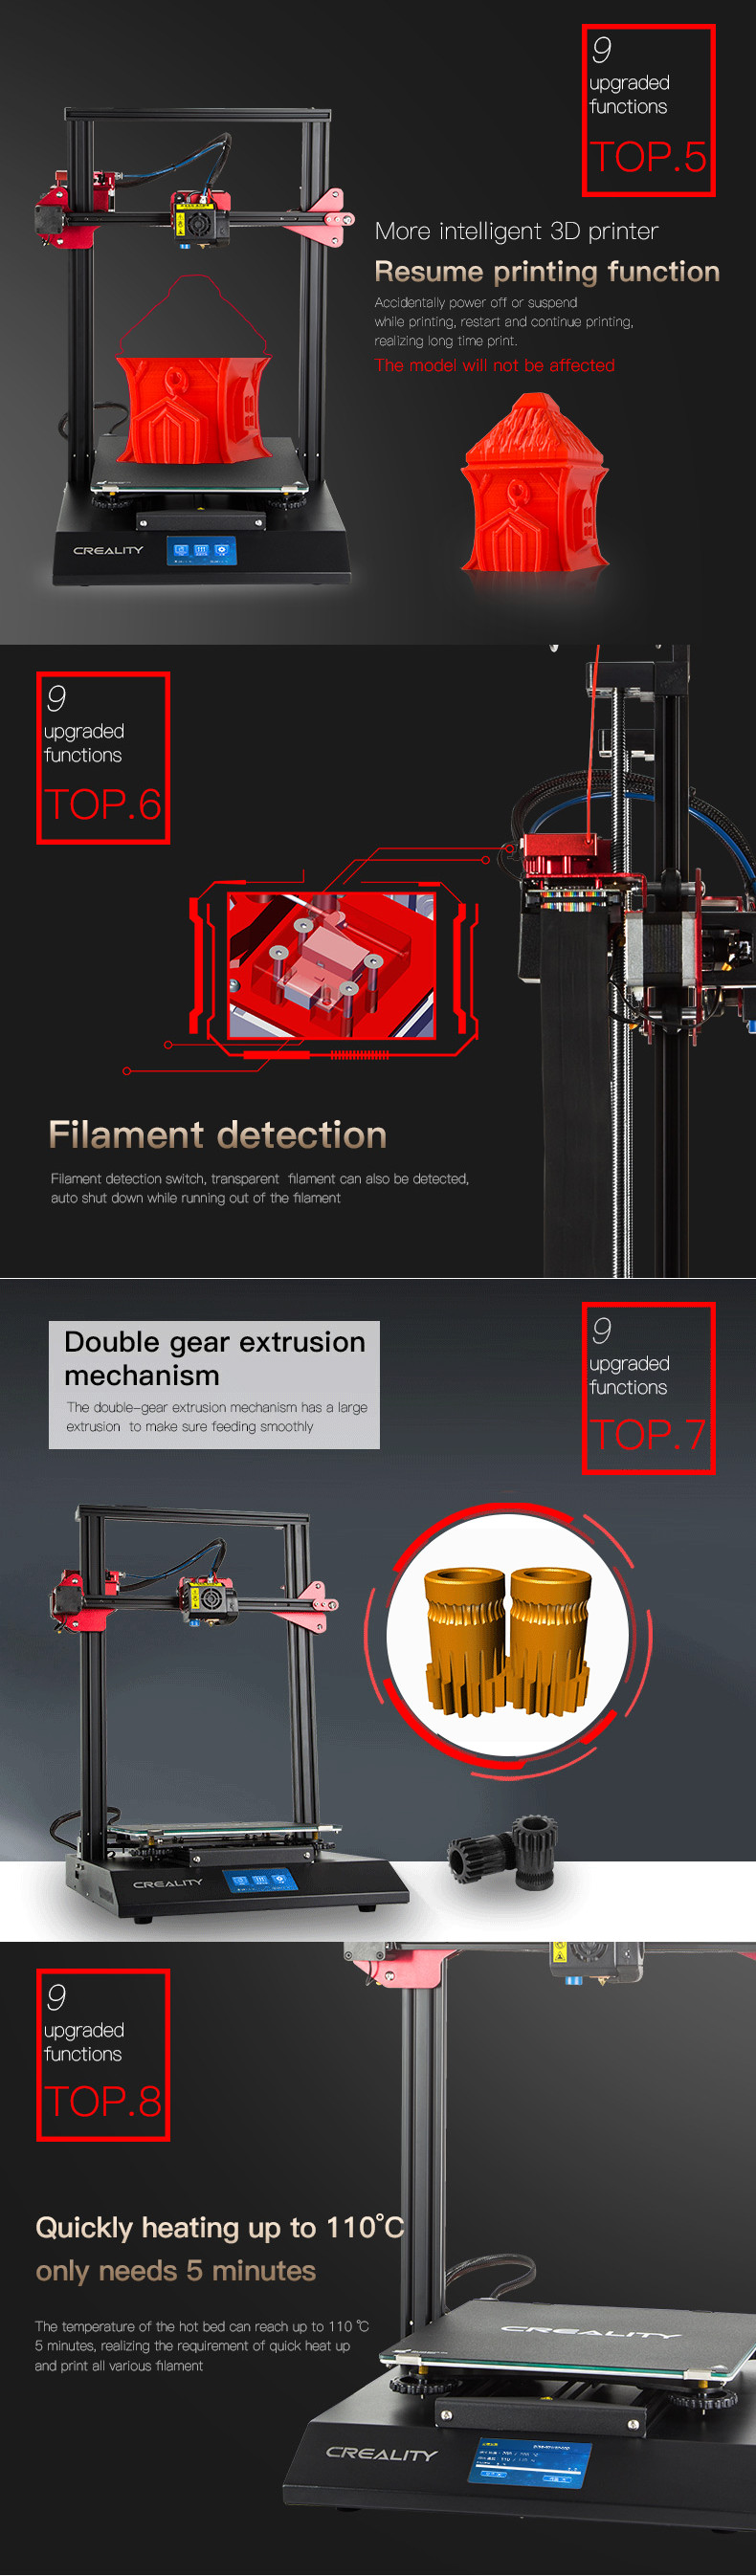 Creality 3D® CR-10S Pro DIY 3D Printer Kit 300*300*400mm Printing